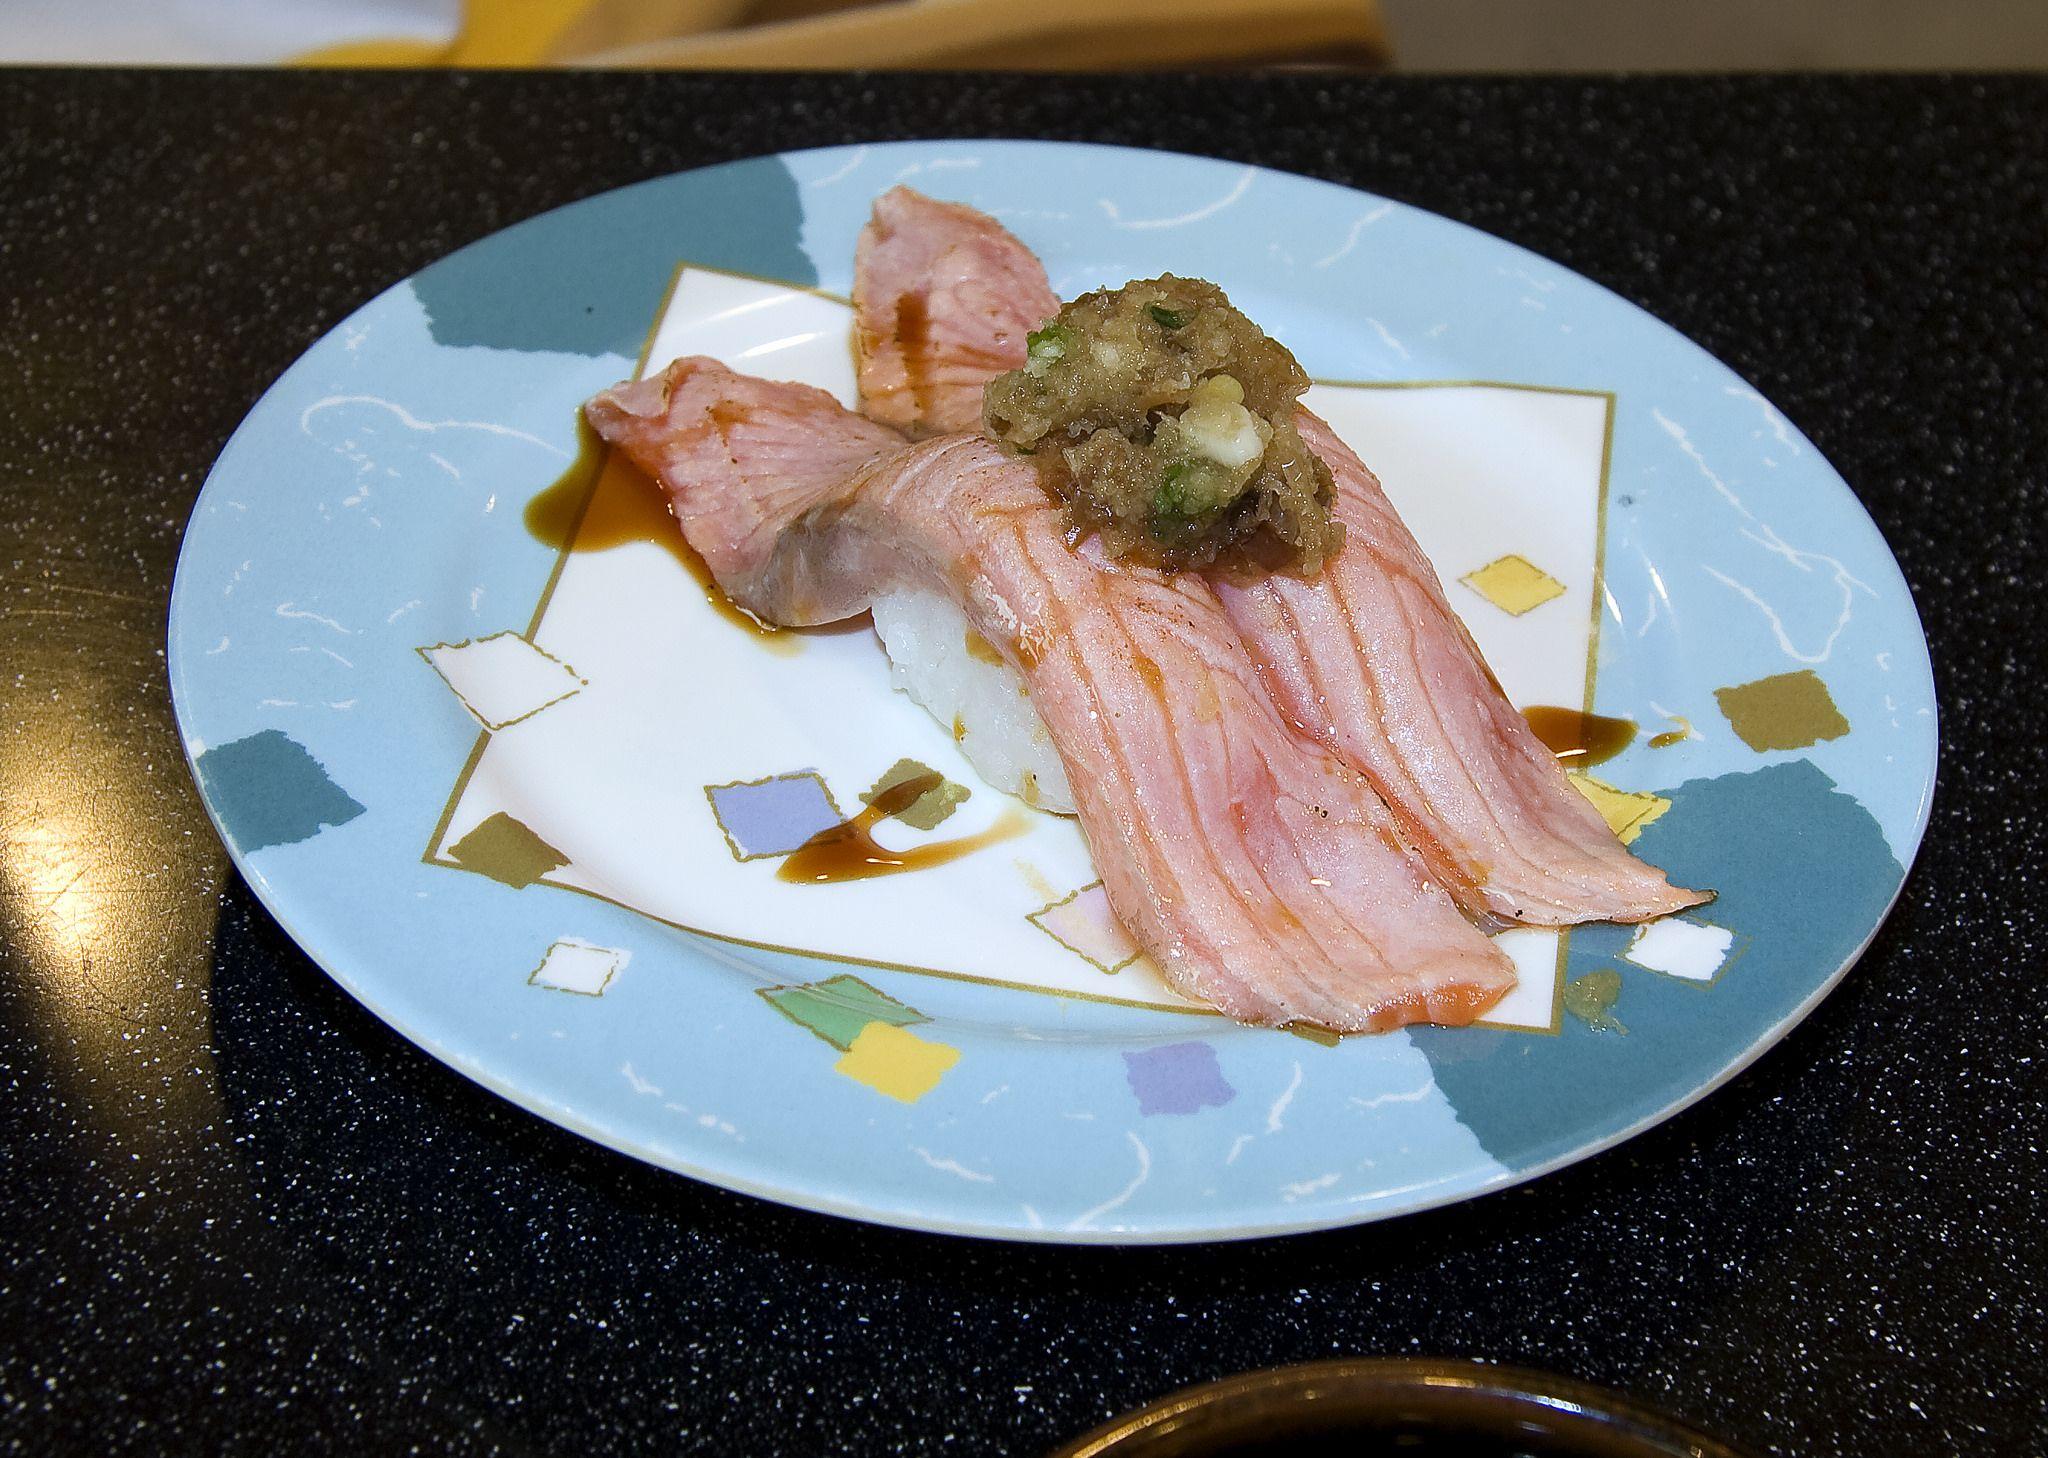 https://flic.kr/p/pf9NUf | aburi sushi : 살짝 데운 스시 | 이런 맛도 신선한 매력입니다